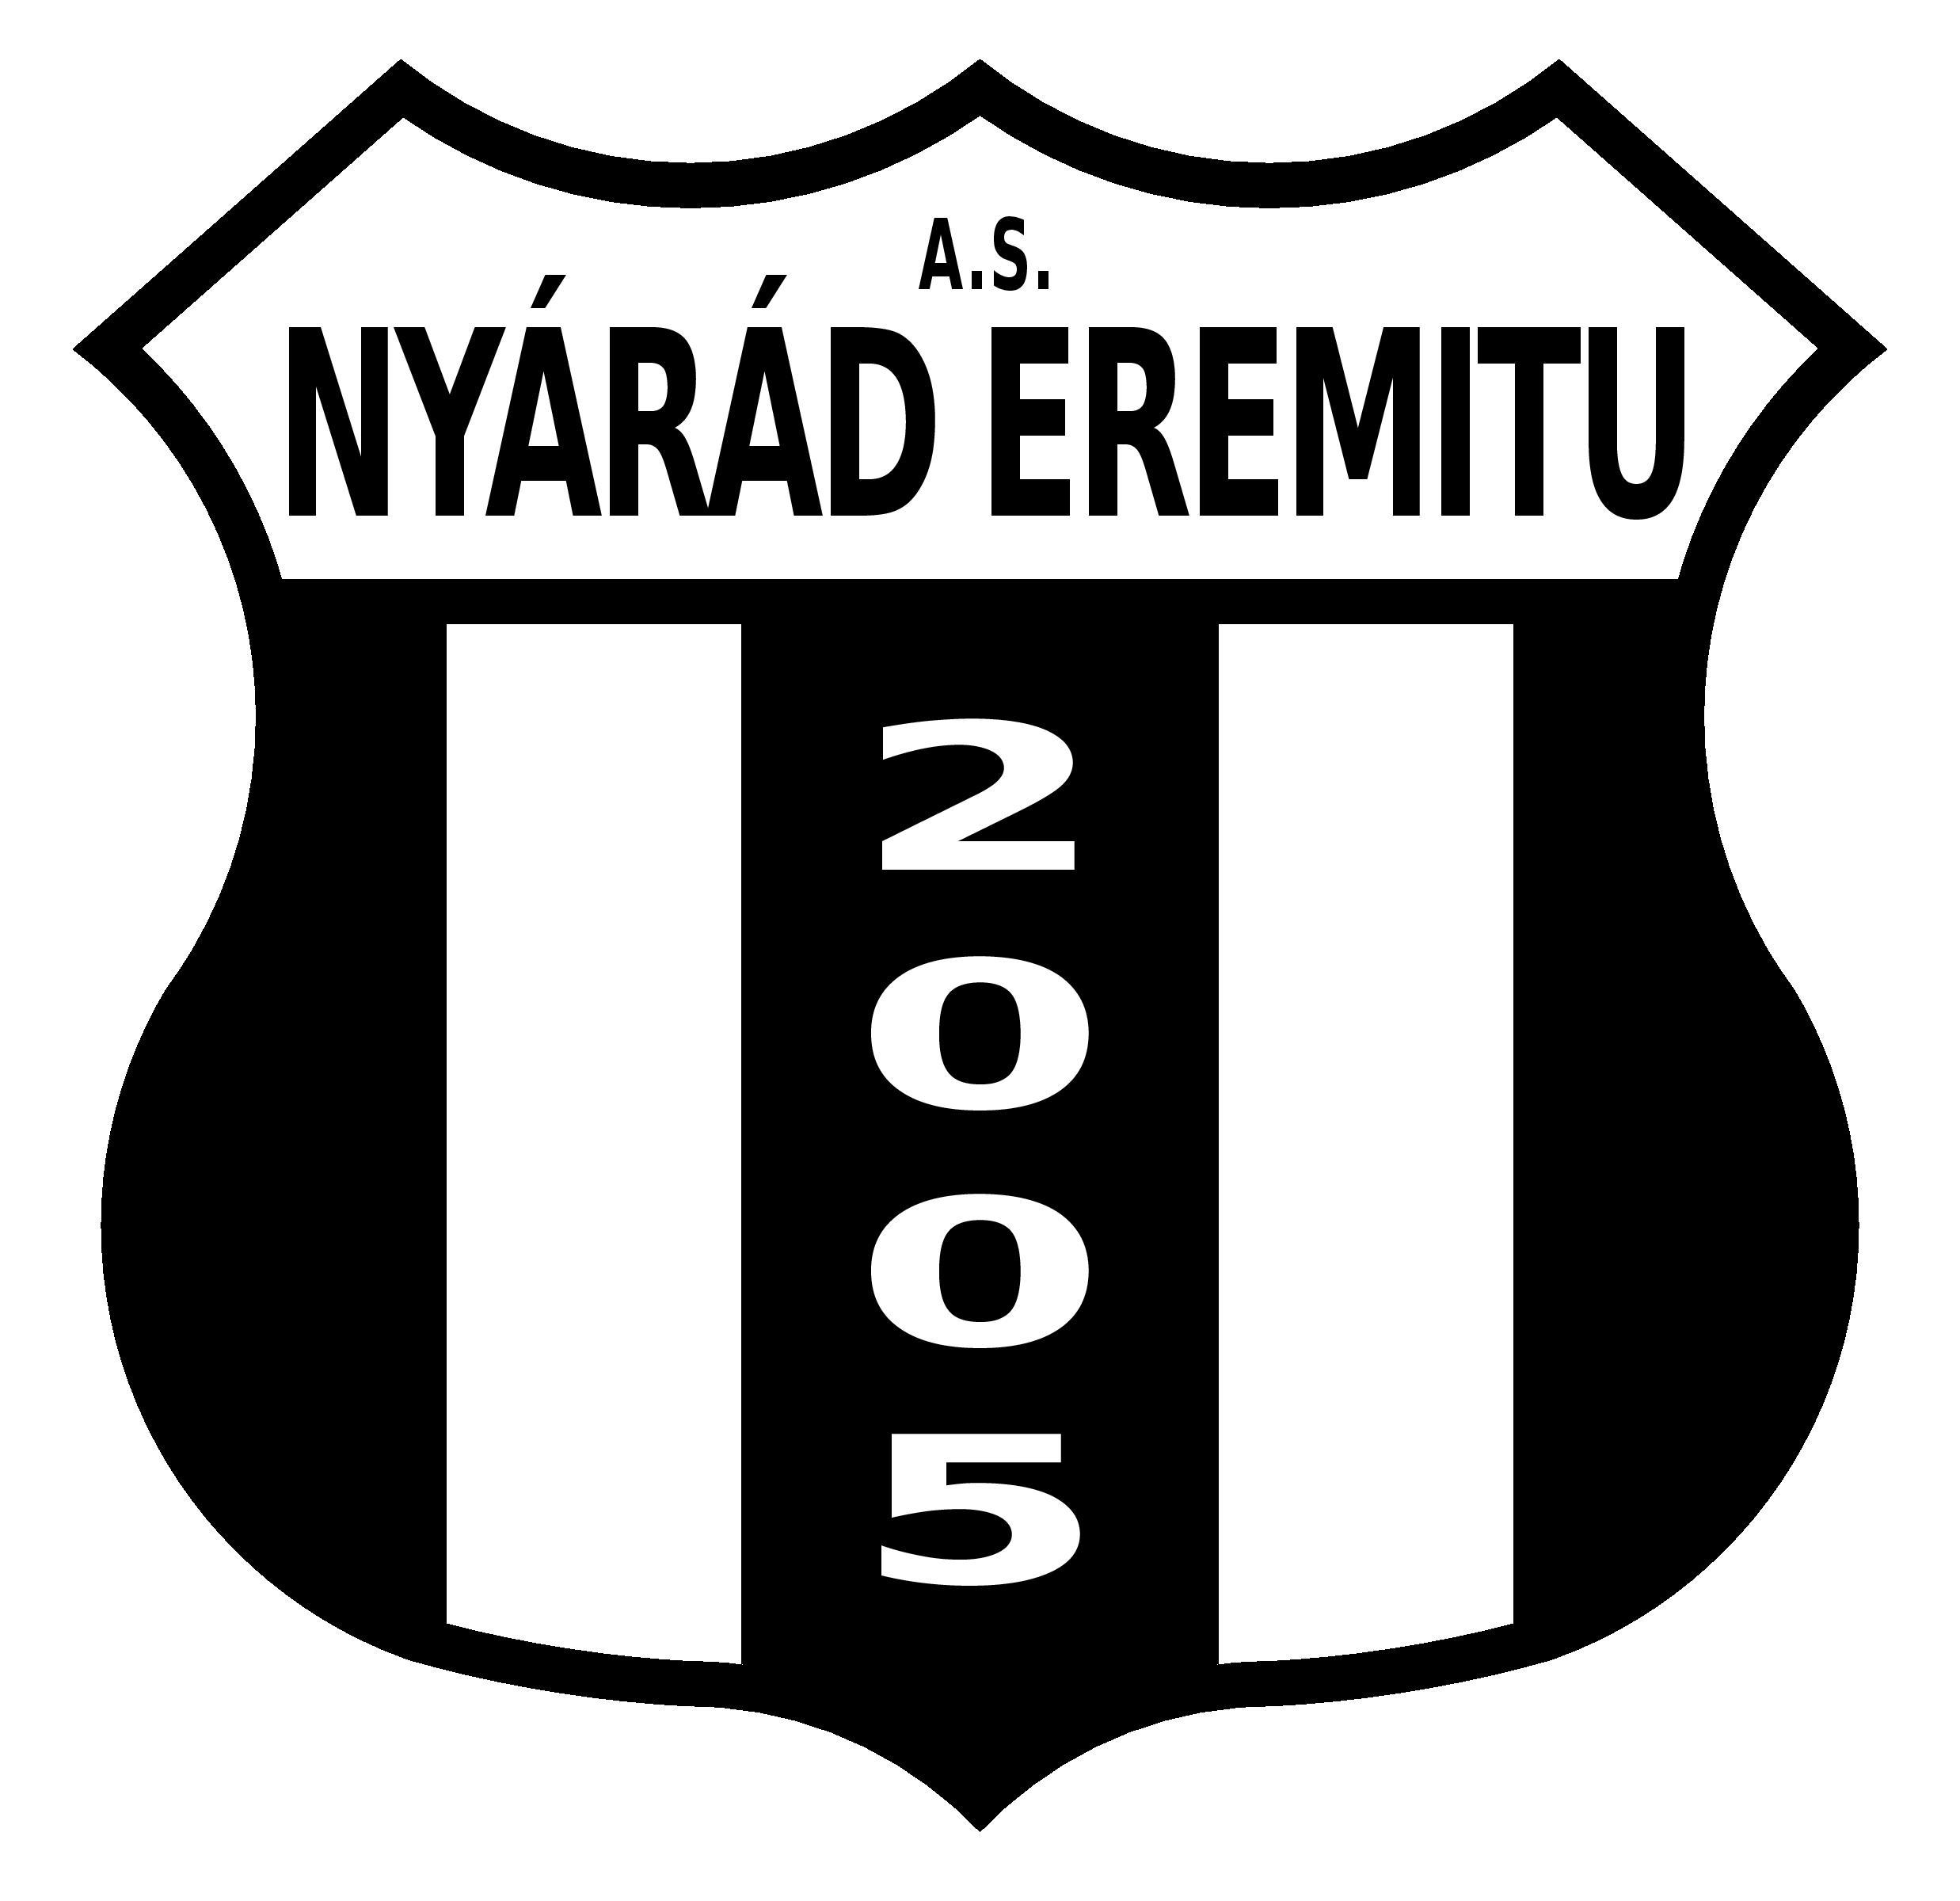 A.S. NYARAD EREMITU